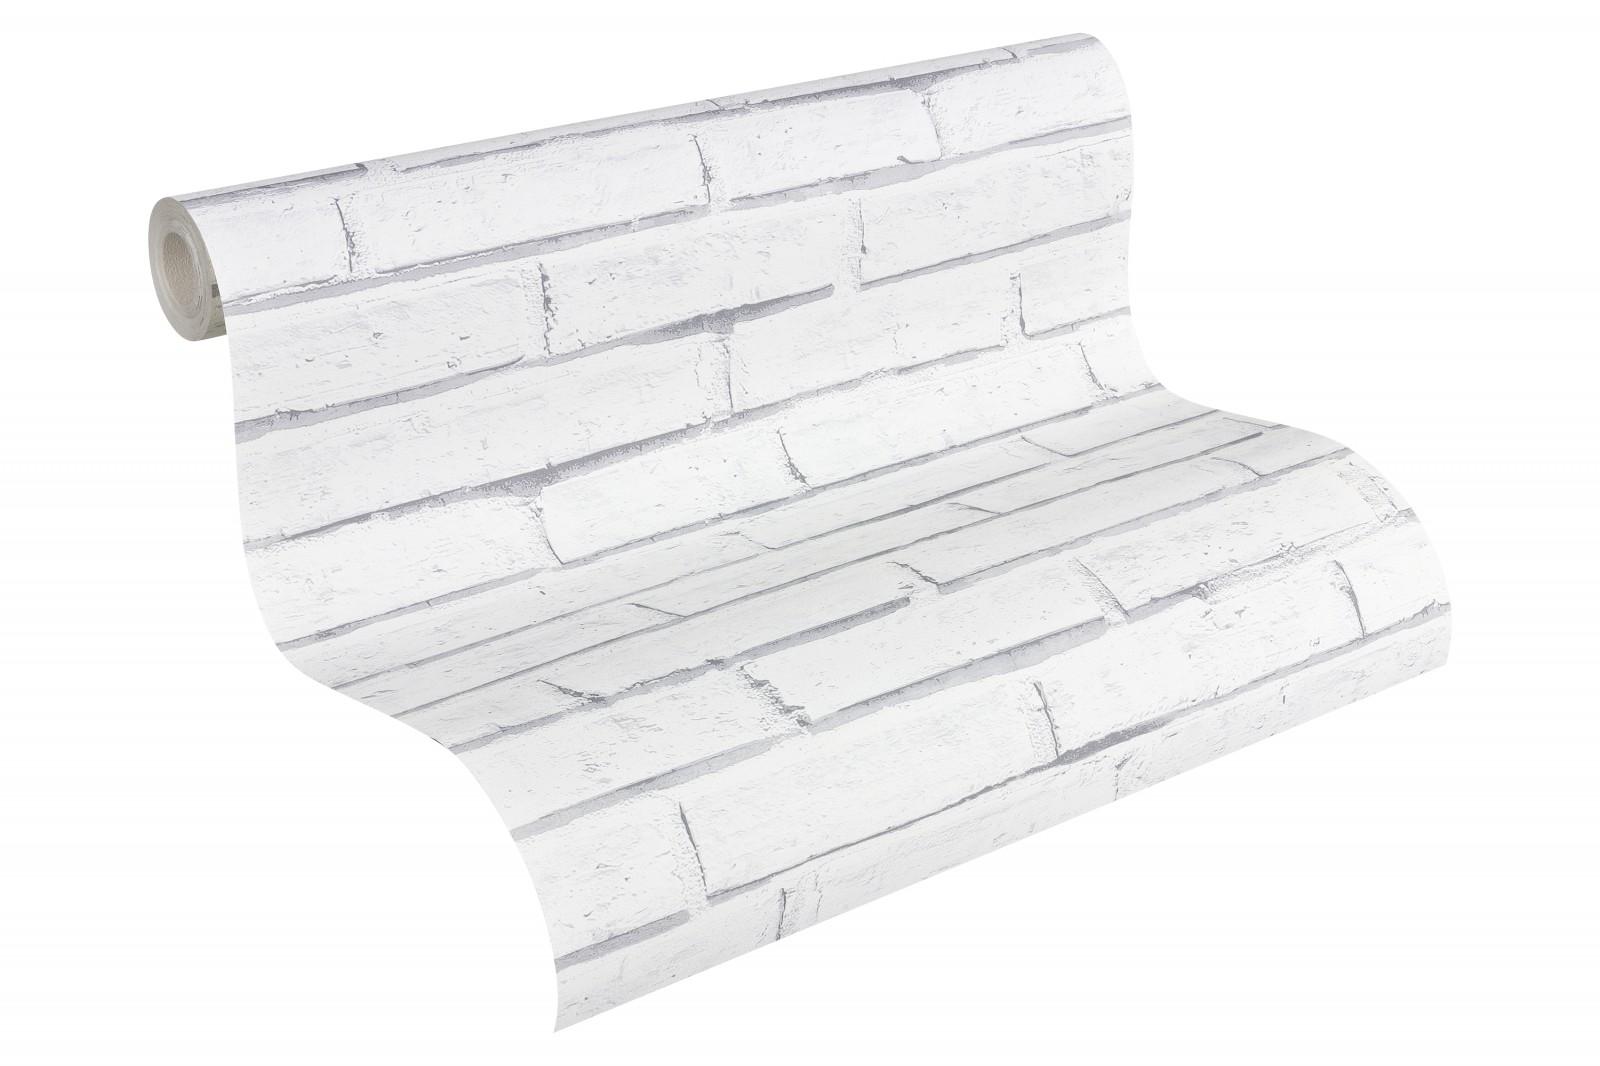 tapete steine steinwand wei as creation 30169 2. Black Bedroom Furniture Sets. Home Design Ideas